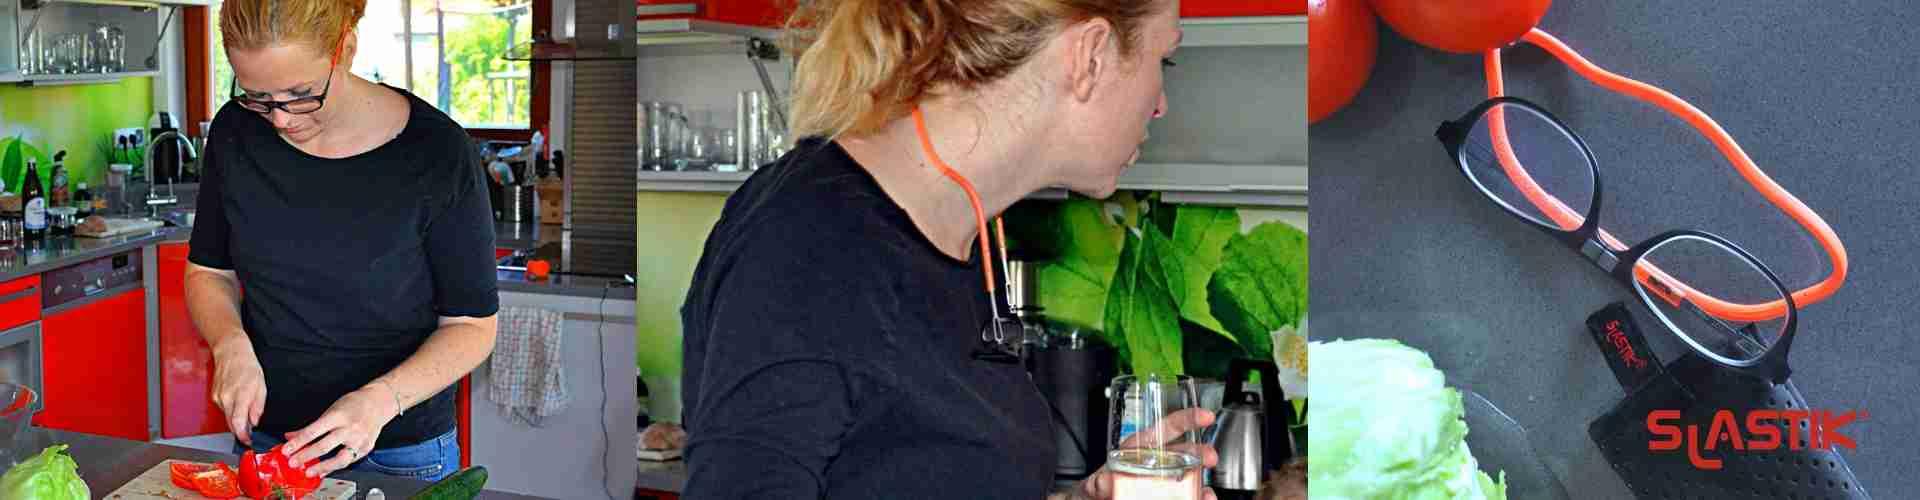 Dioptrické brýle na magnet Slastik Veeka